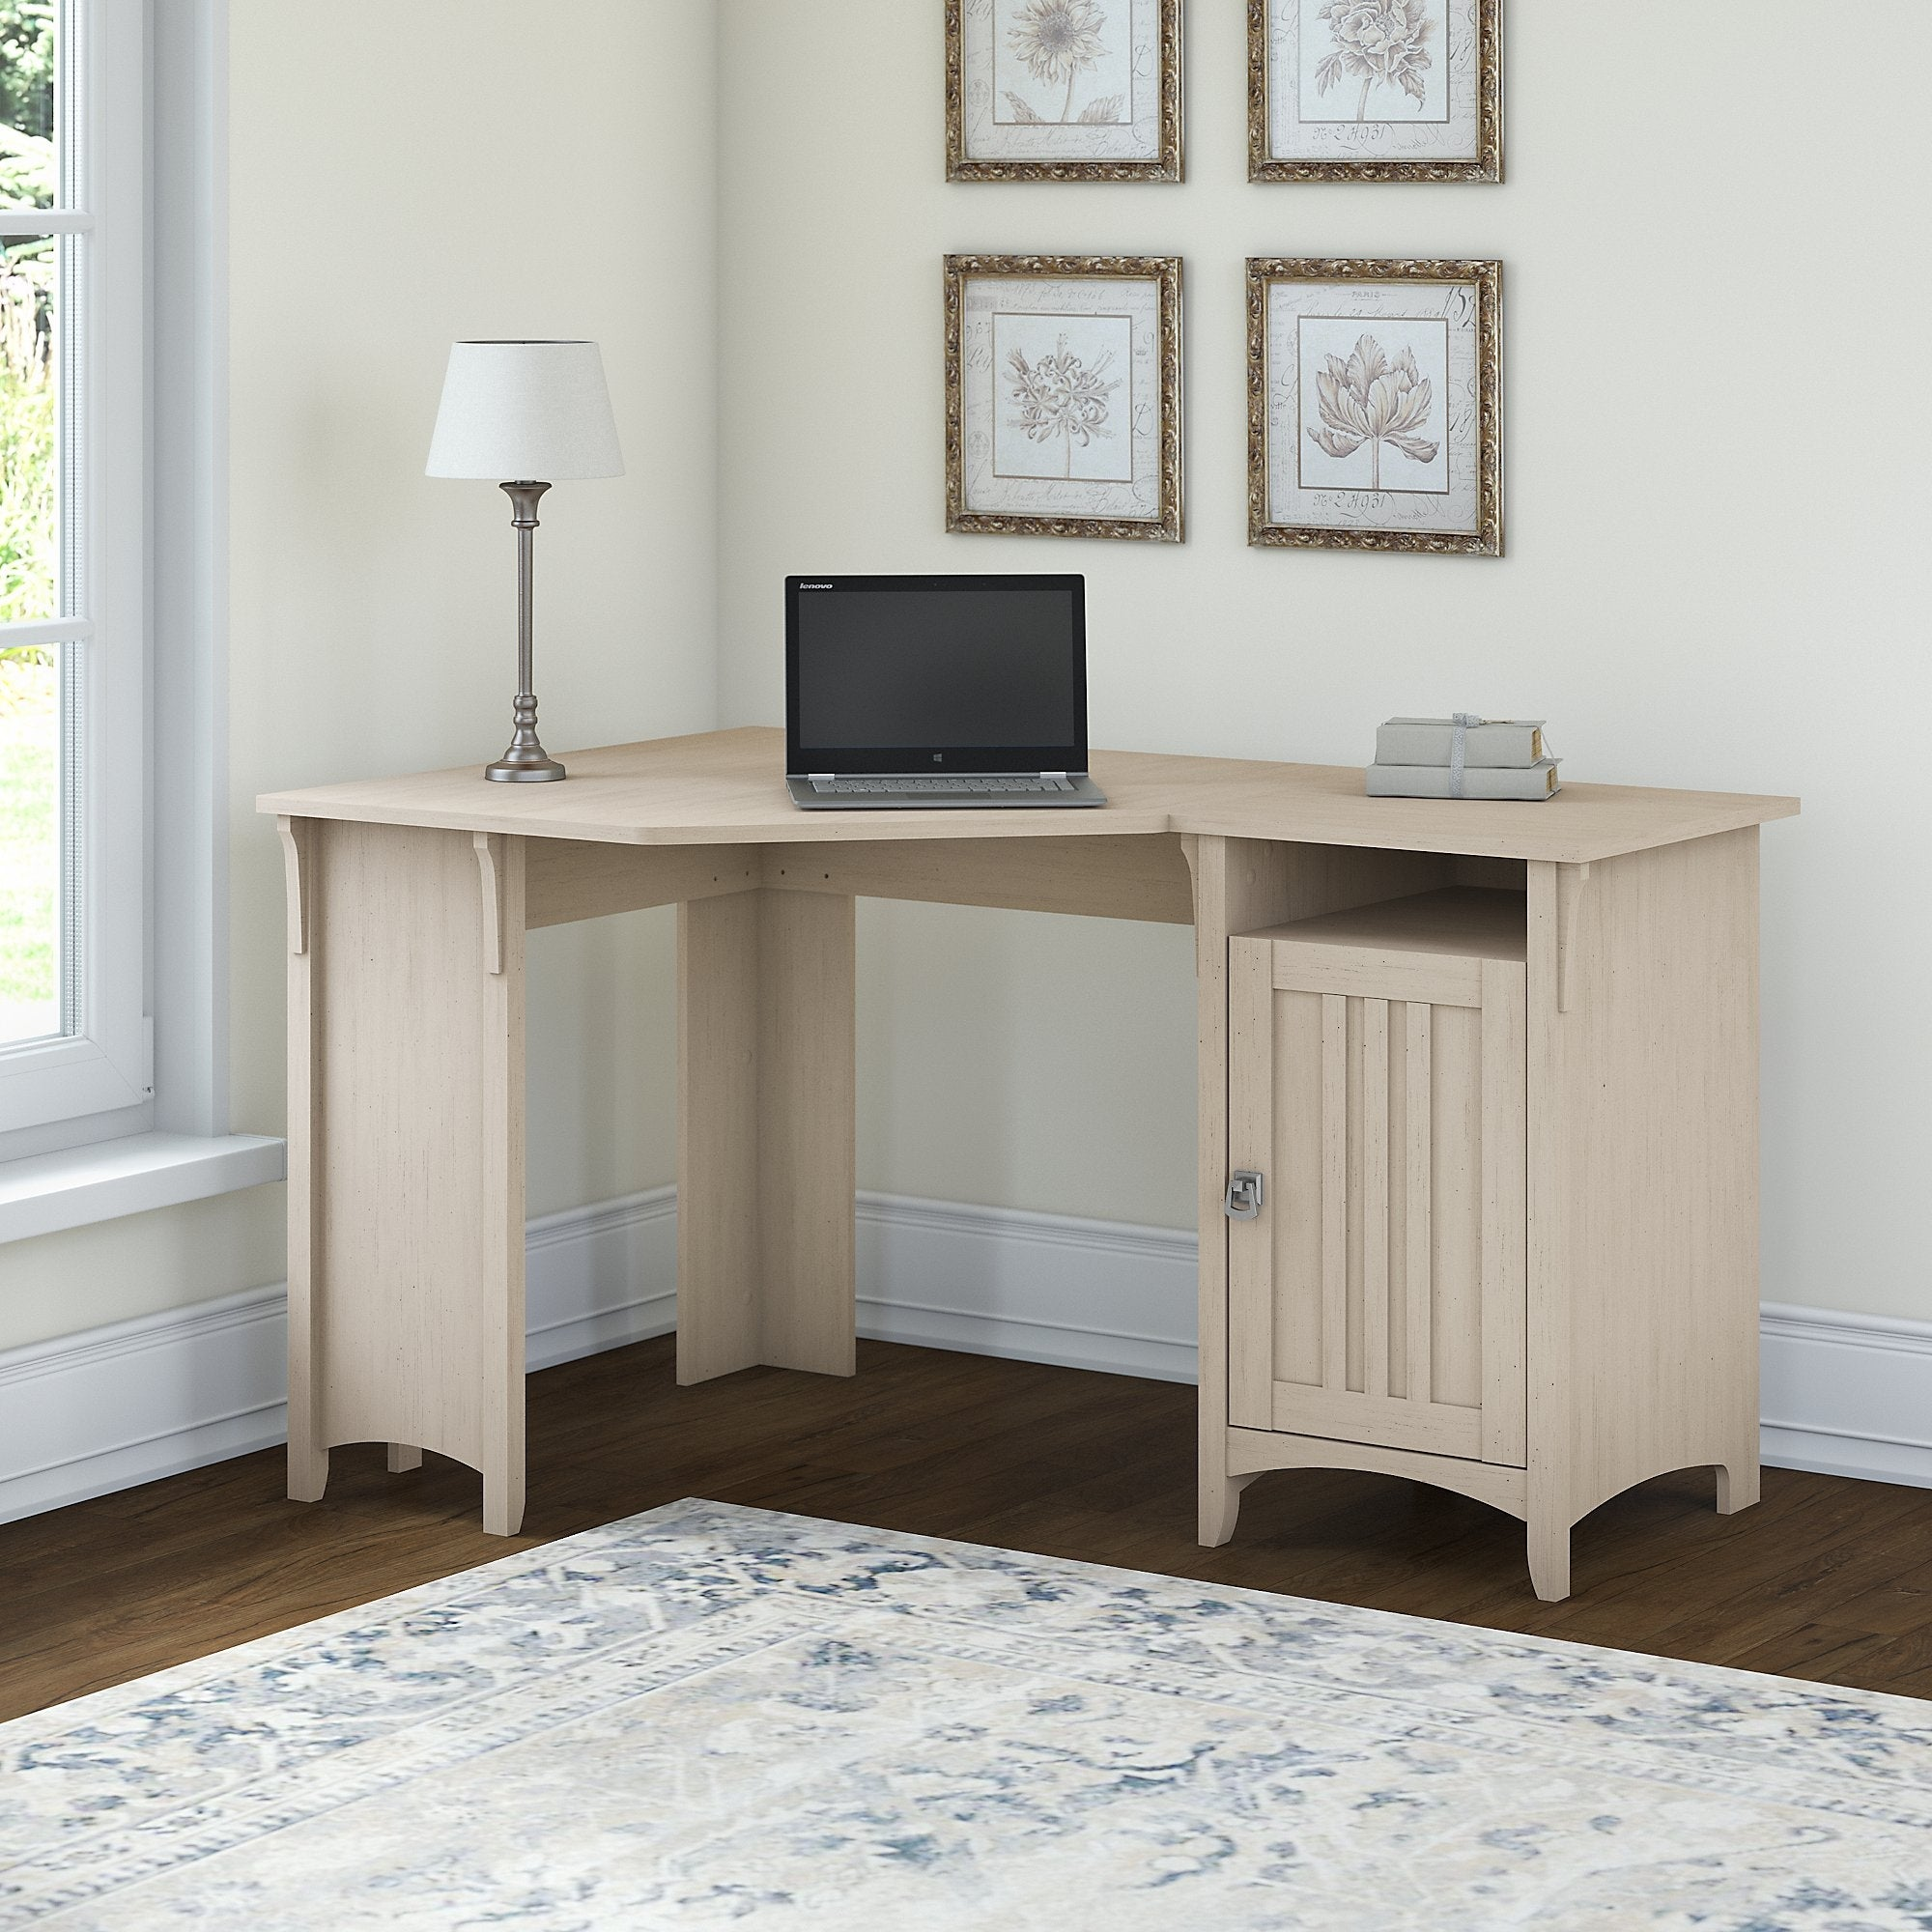 The Gray Barn Lowbridge Corner Desk with Storage